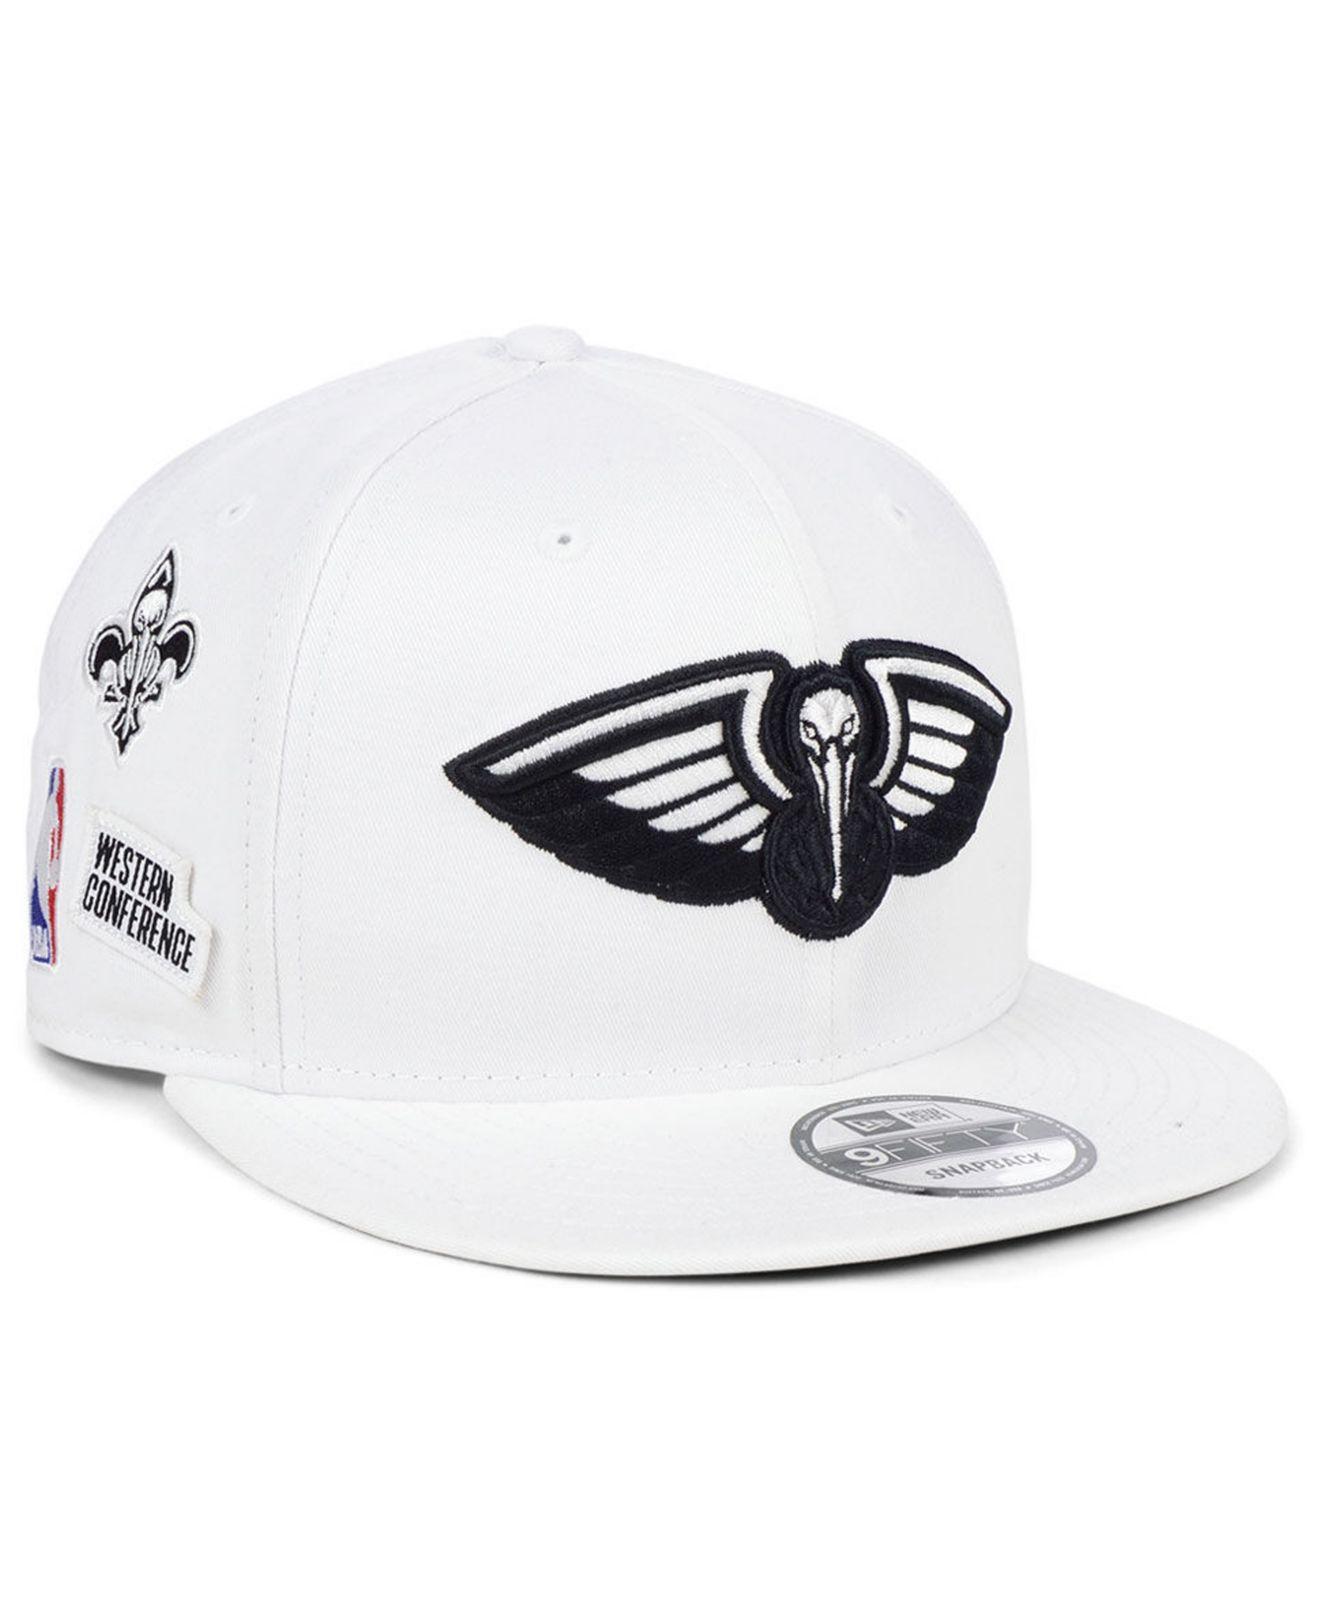 super popular cfba3 e883c KTZ. Men s White New Orleans Pelicans Night Sky 9fifty Snapback Cap